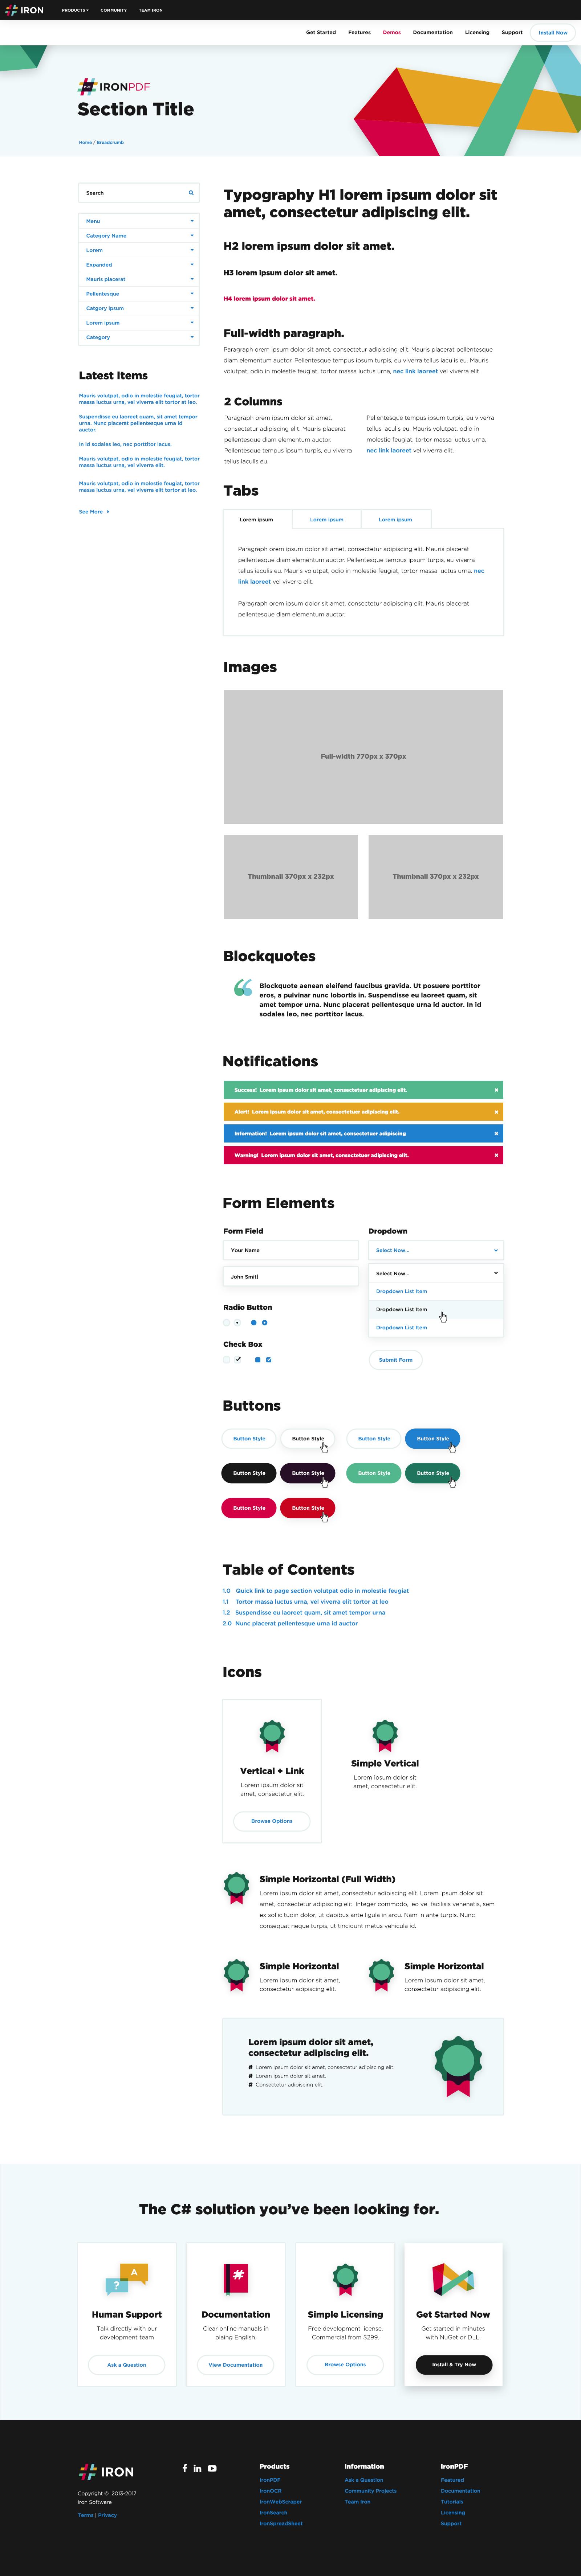 IronPDF - Generic Template, UI Kit (Docs/Demos/Tuts)